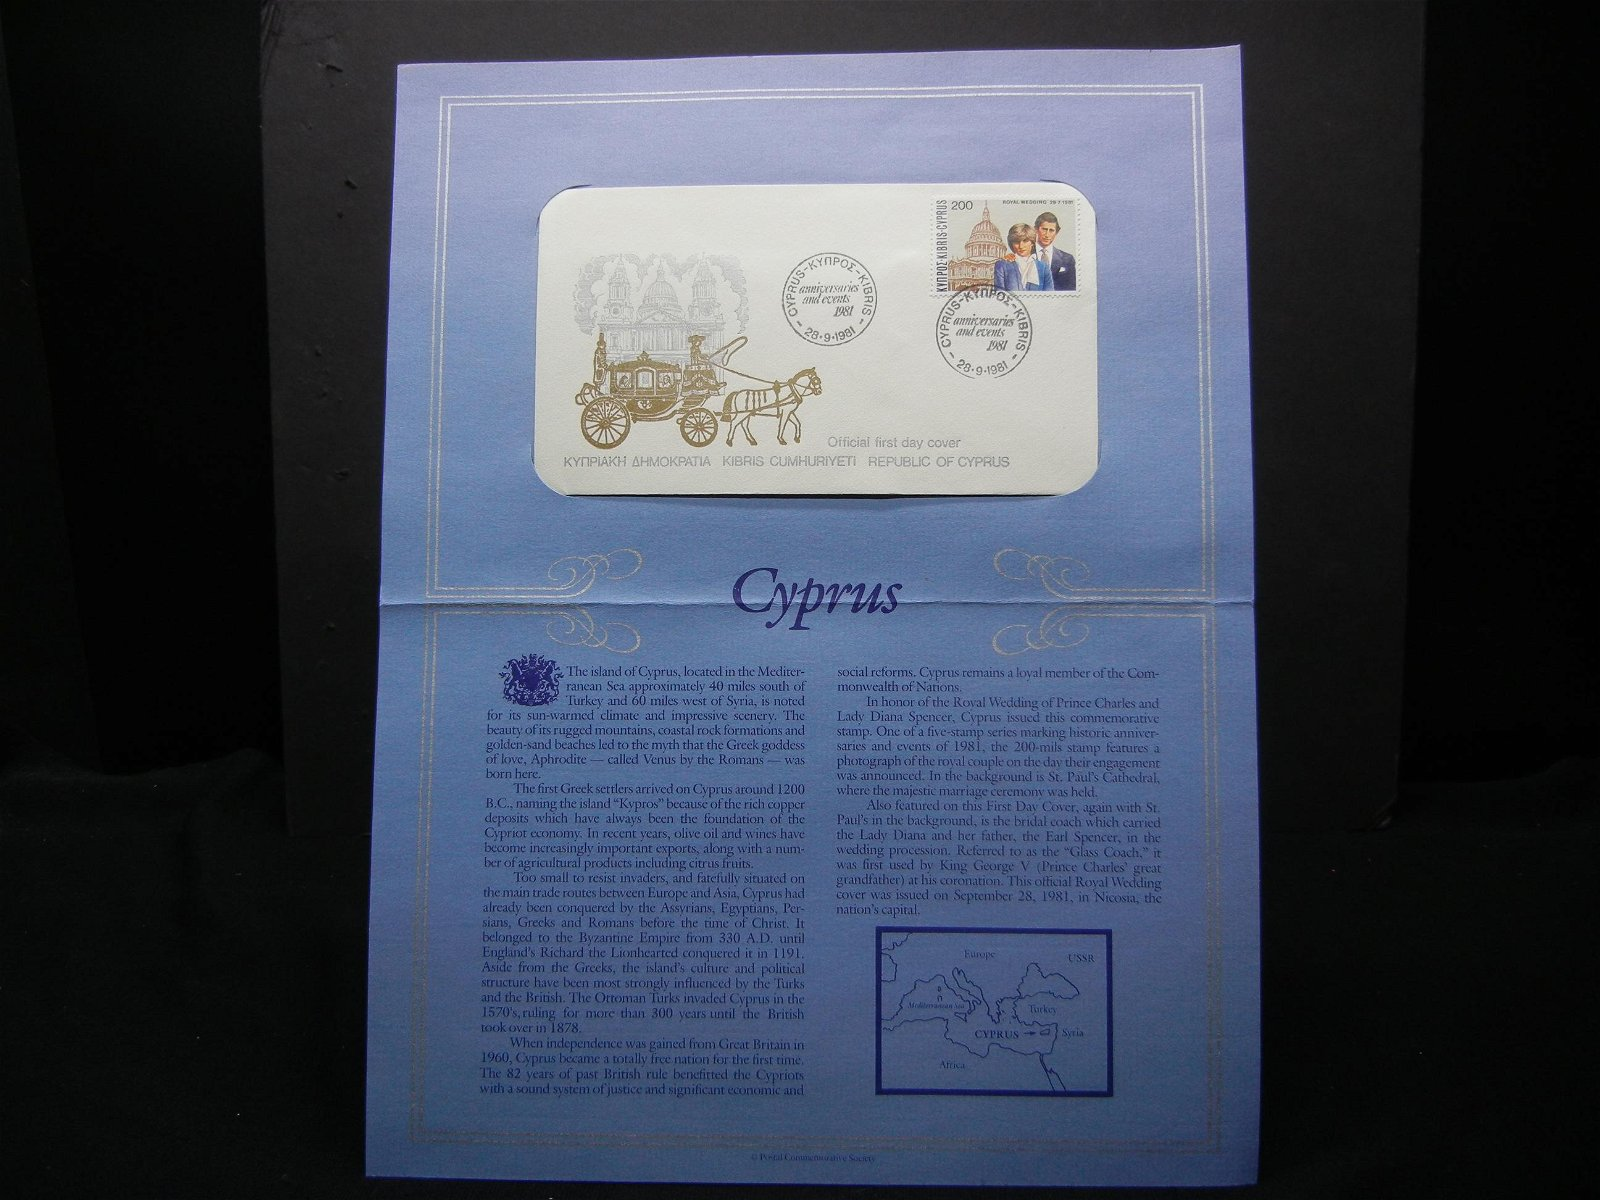 Princess Diana Wedding Commemoration Cyprus Stamp